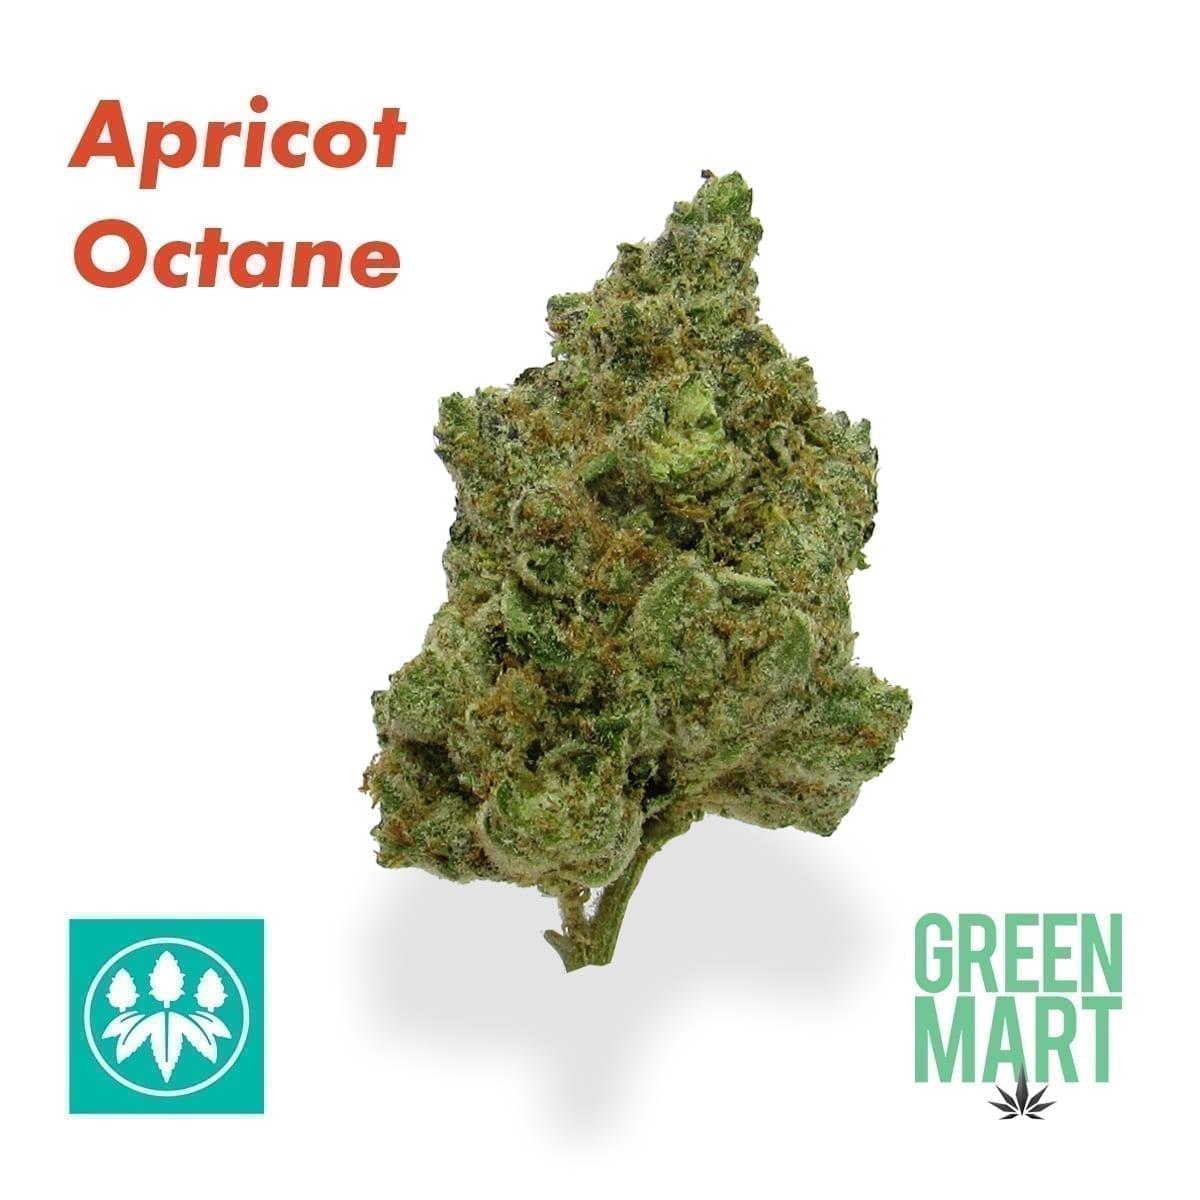 Apricot Octane